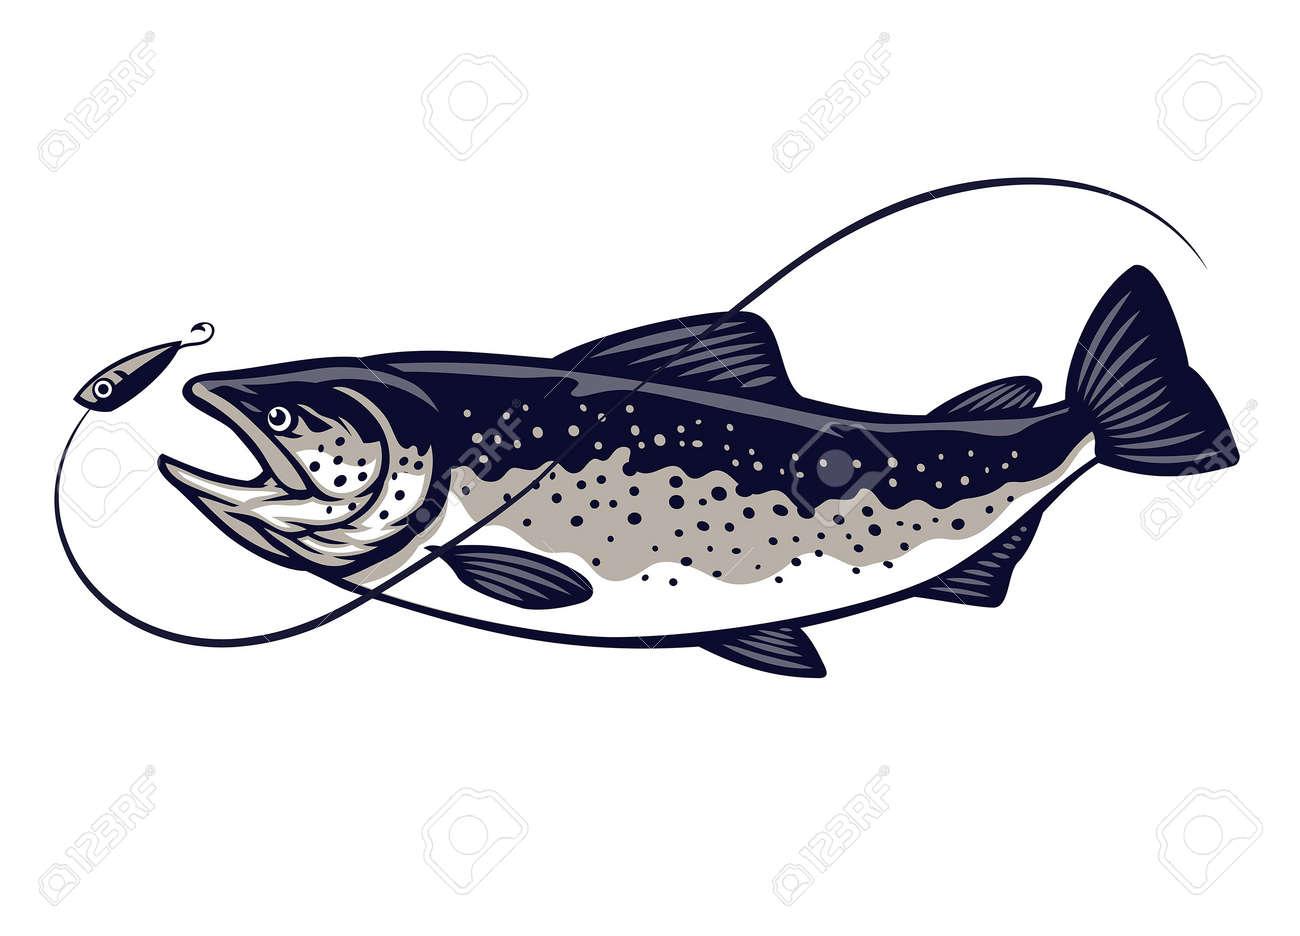 salmon fish swimming catching the lure - 167531823